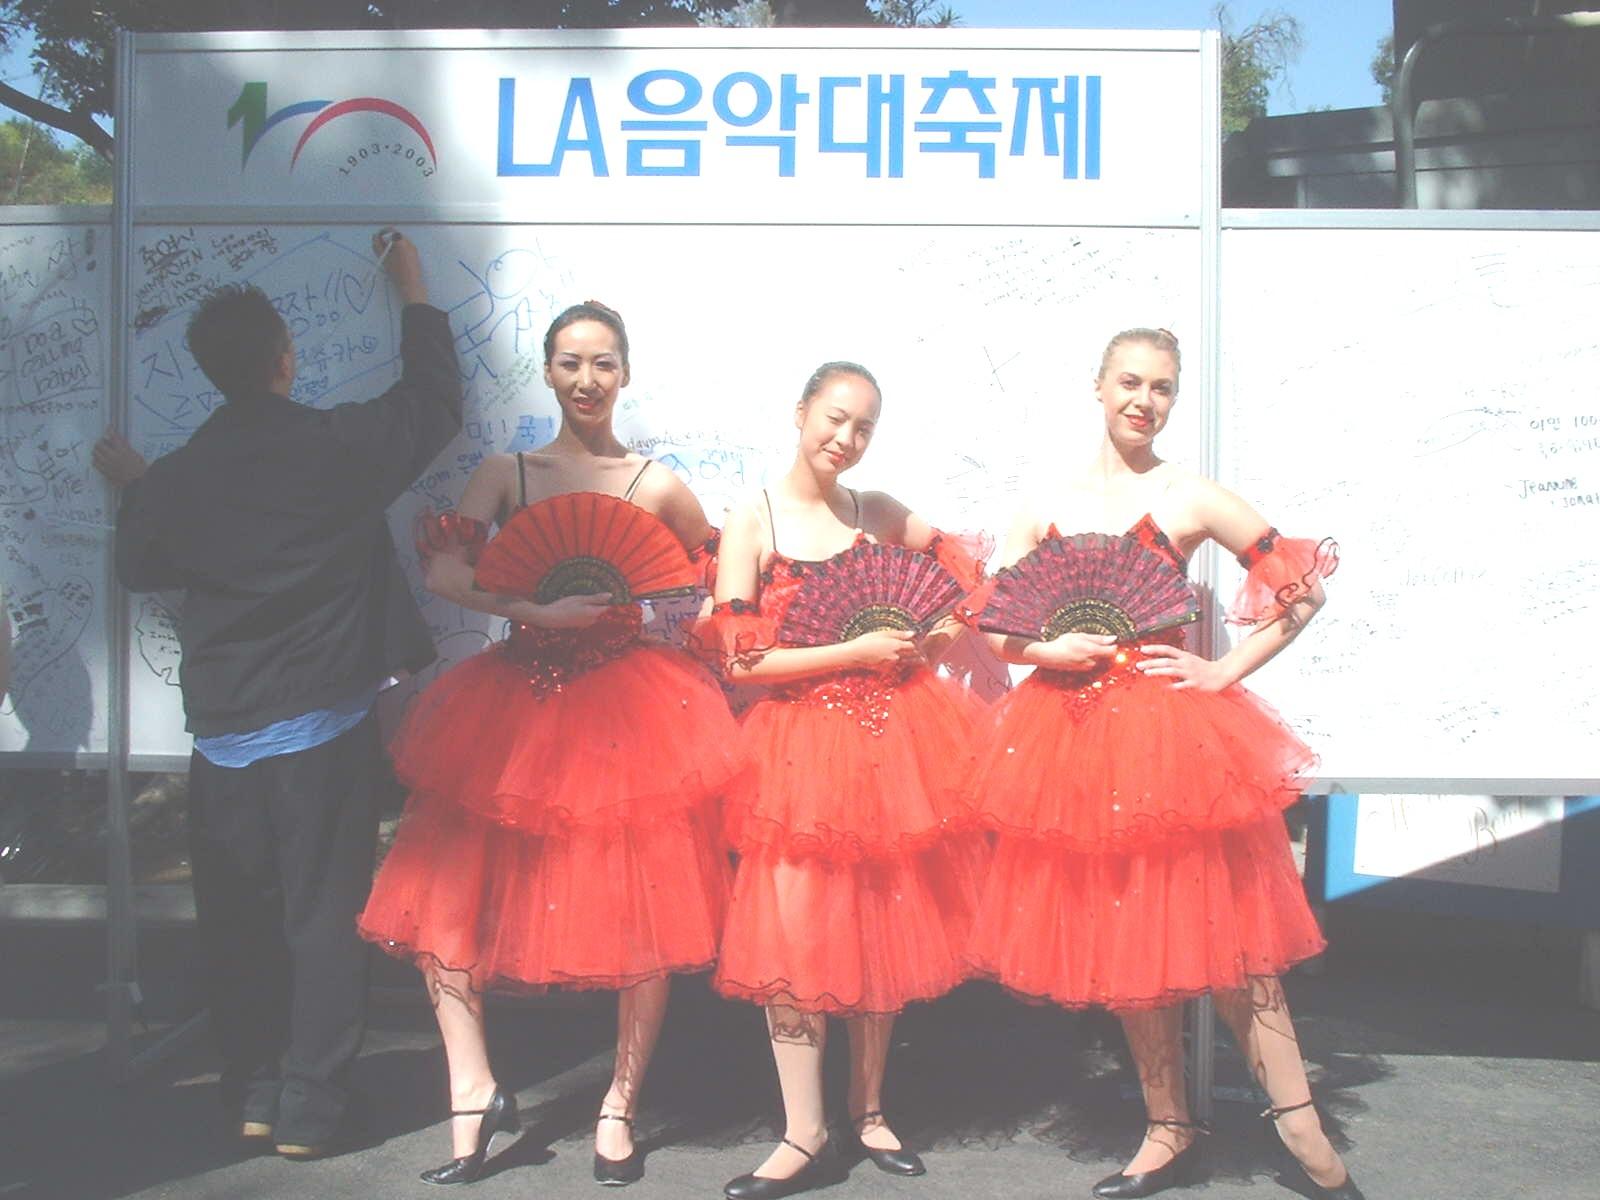 Jean Ballet School